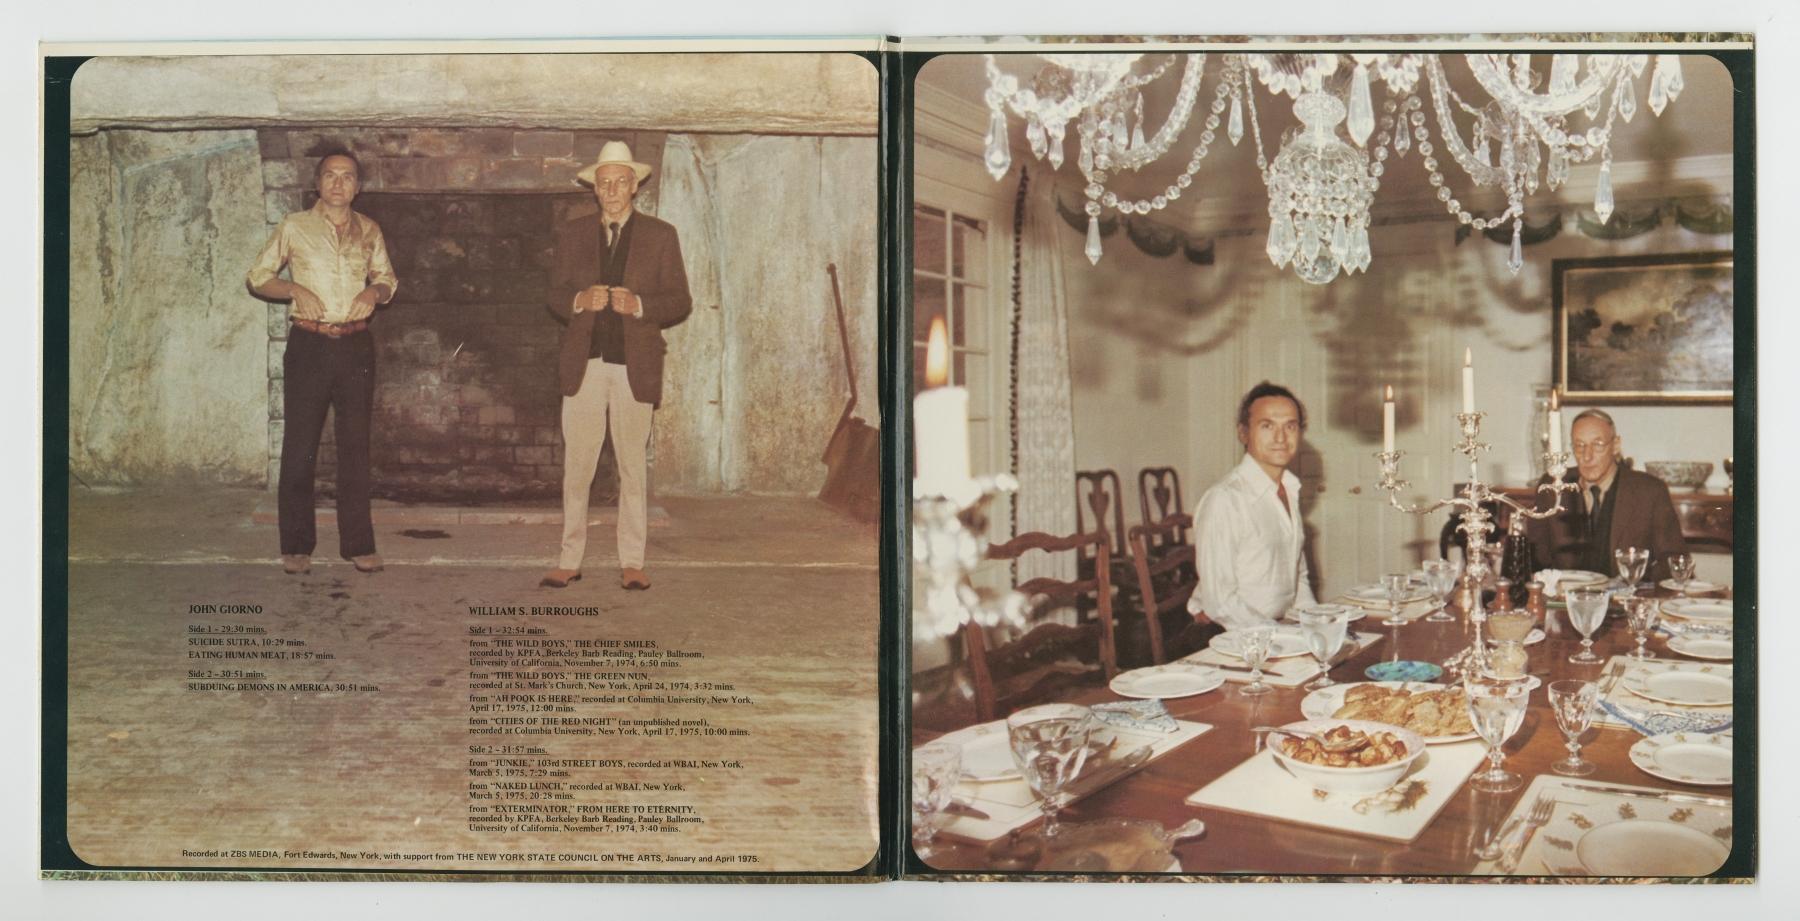 William S. Burroughs / John Giorno: A D'Arc Press Selection (1975), inside spread